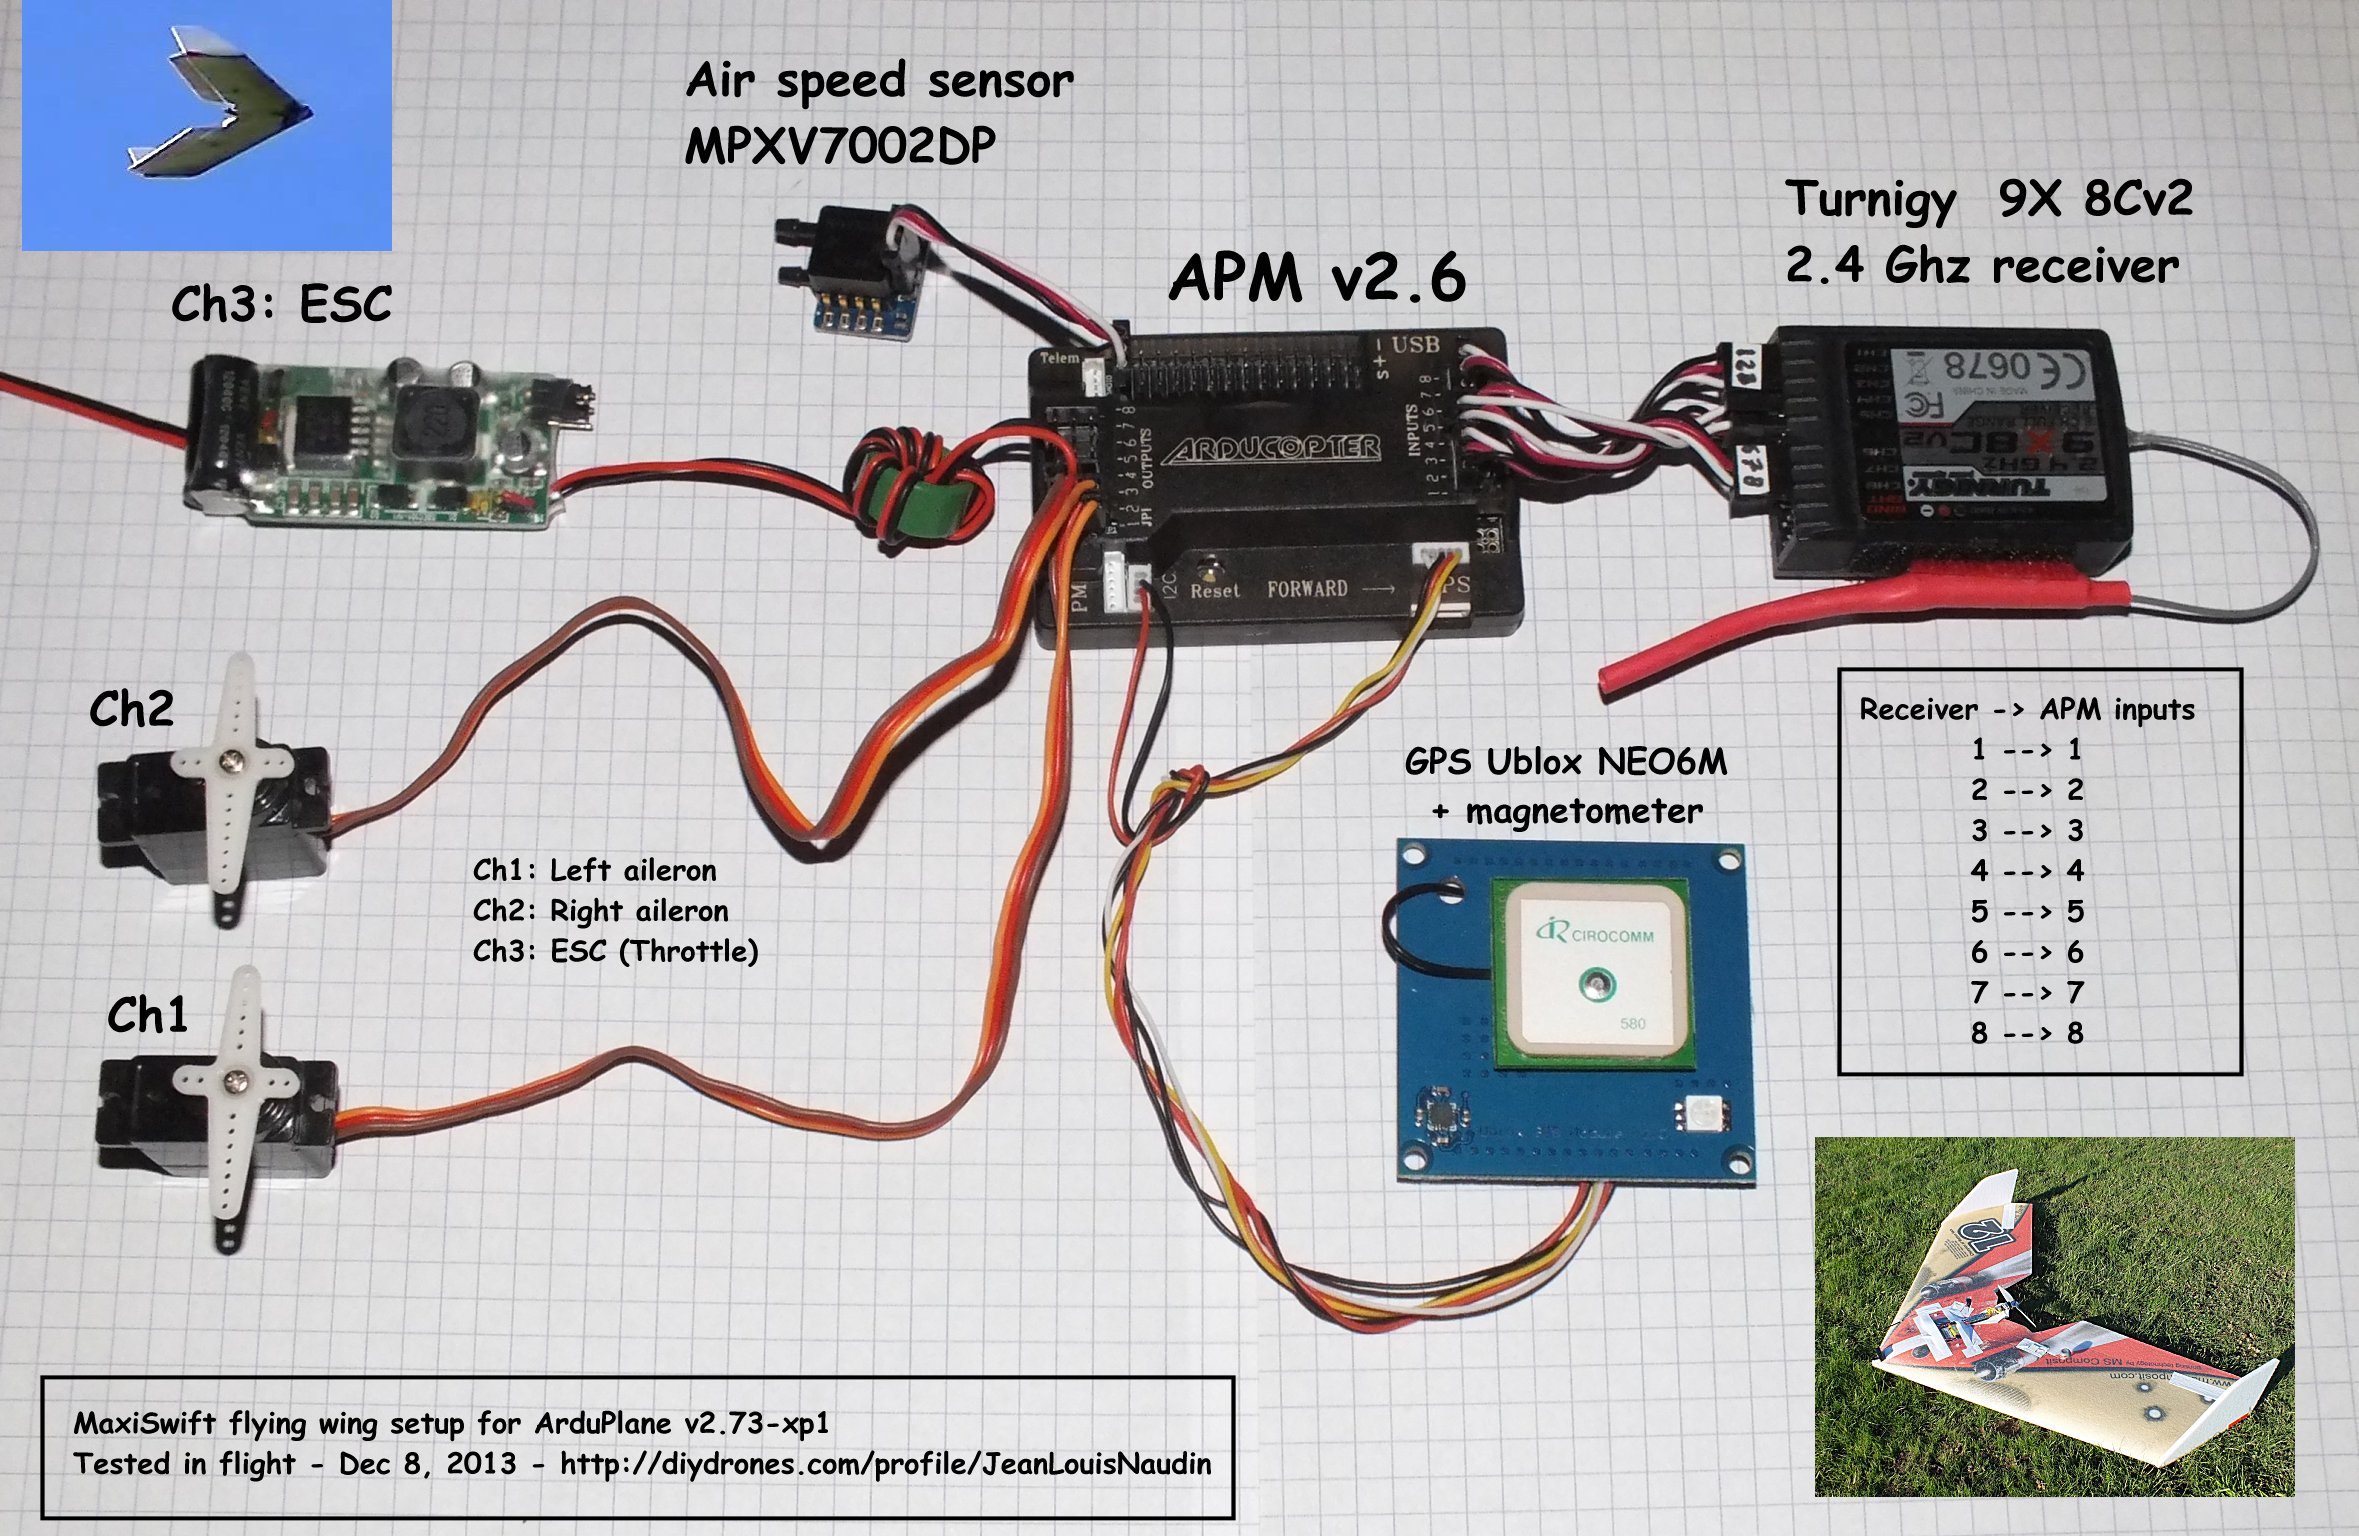 quadcopter ardupilot wiring diagrams schematic diagram acm wiring diagram ardupilot wiring diagram wiring schematic diagram drone led circuit wiring diagram apm wiring diagram wiring library